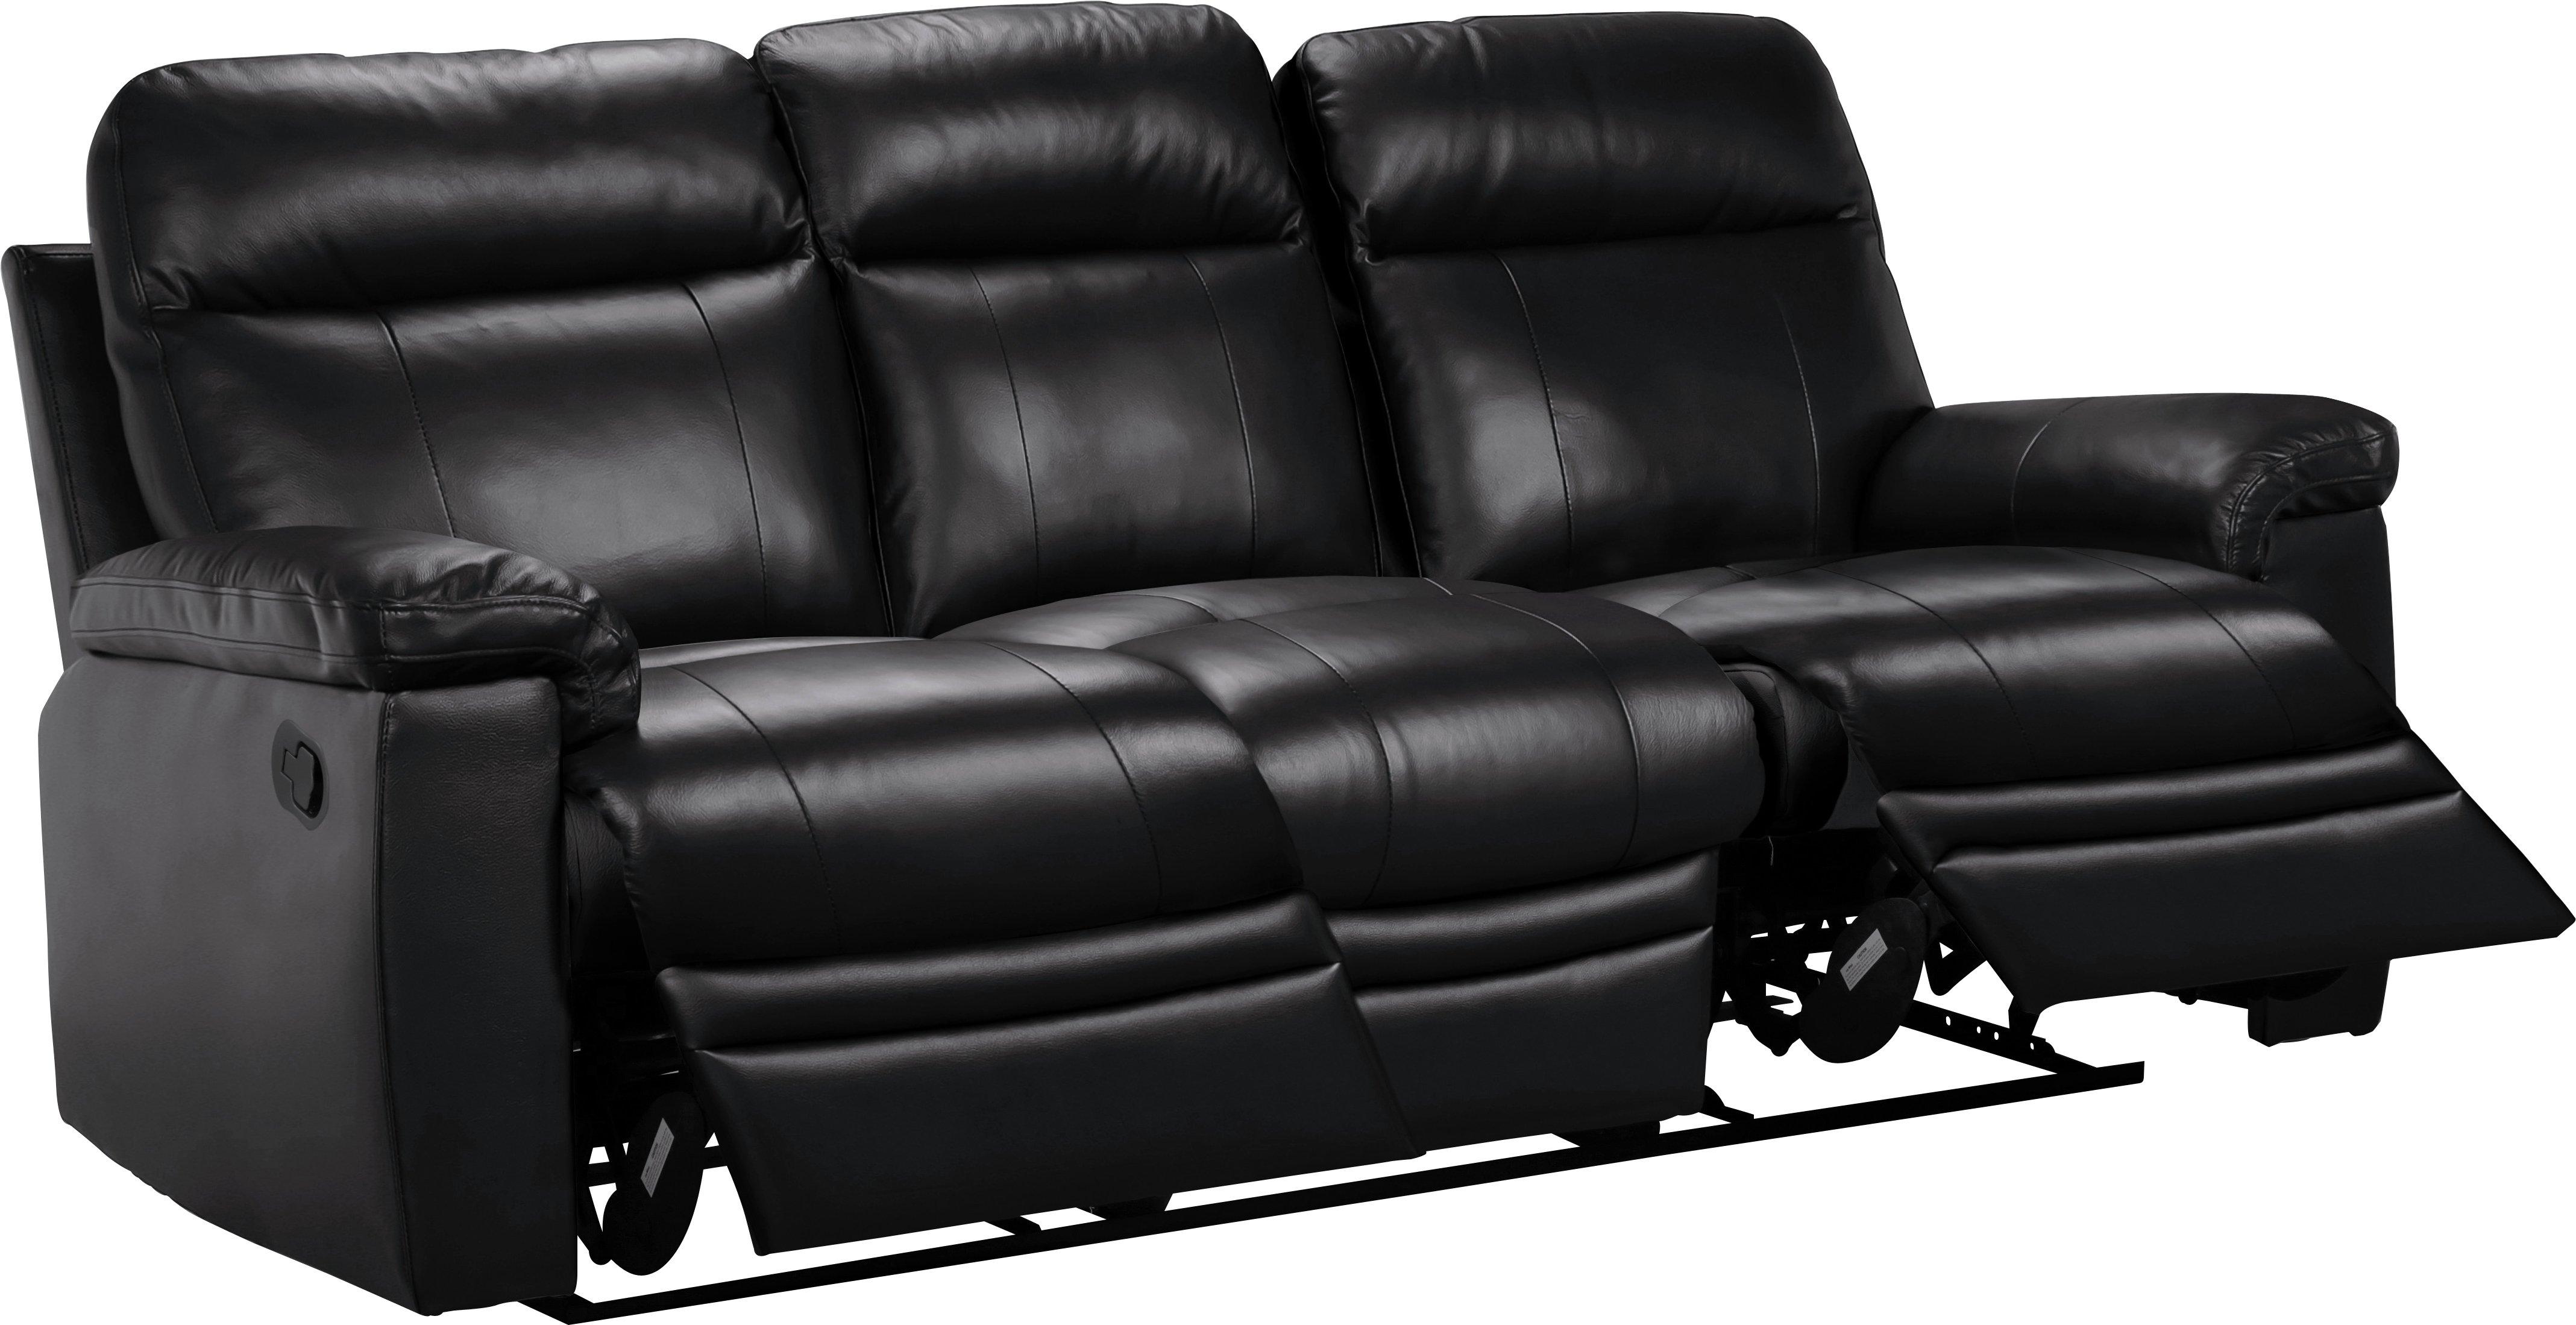 Argos Home Paolo 3 Seater Manual Recliner Sofa - Black